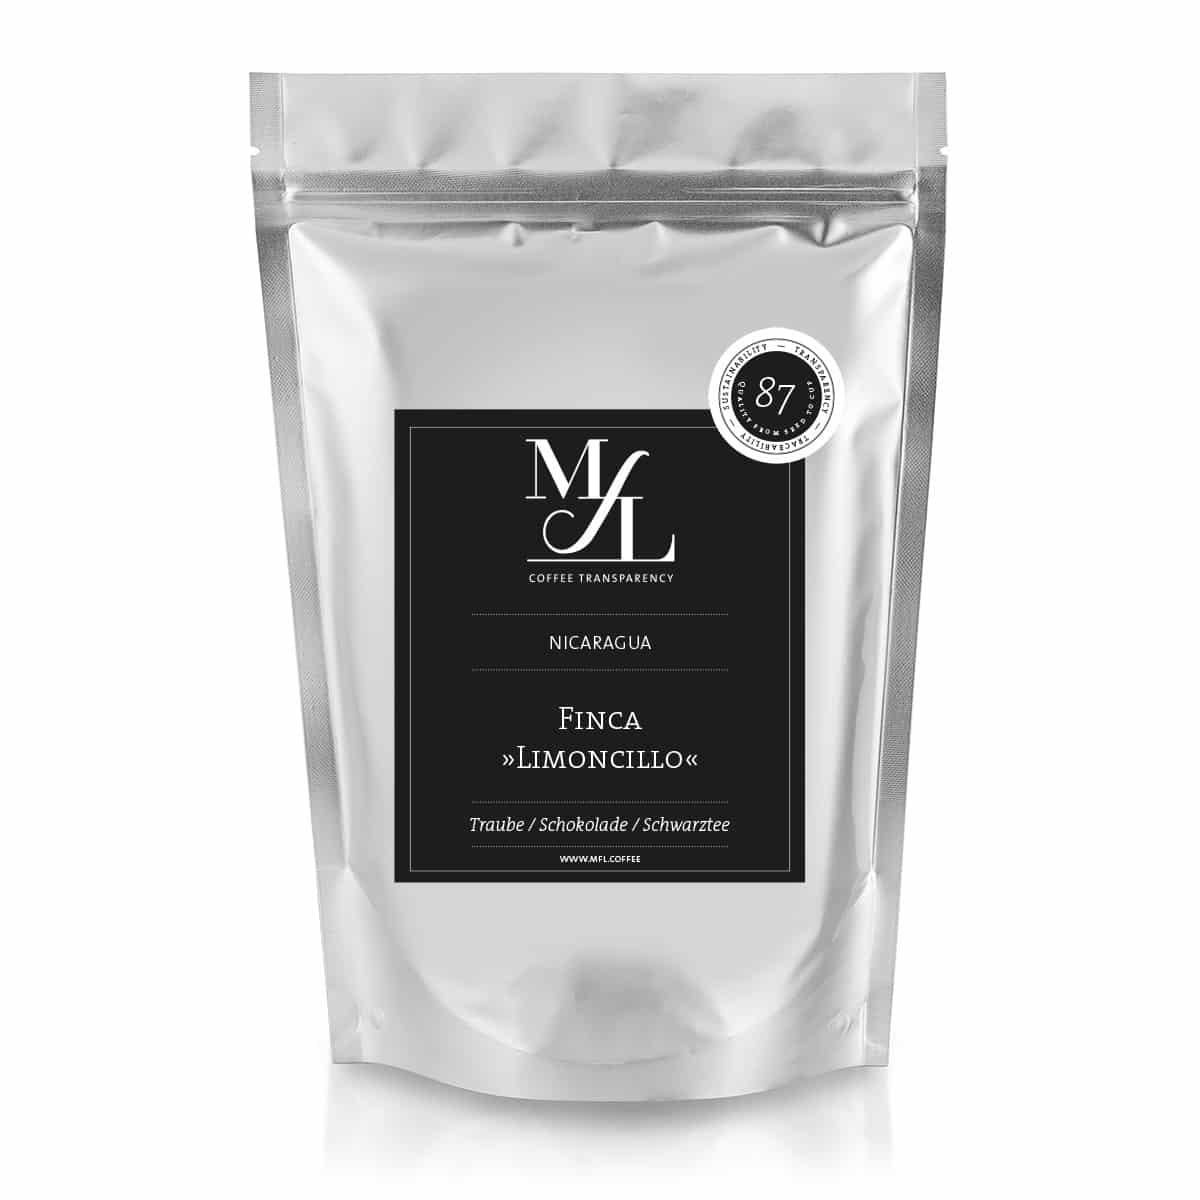 Kaffee-Nicaragua-Finca-Limoncillo-Javanica-vorne